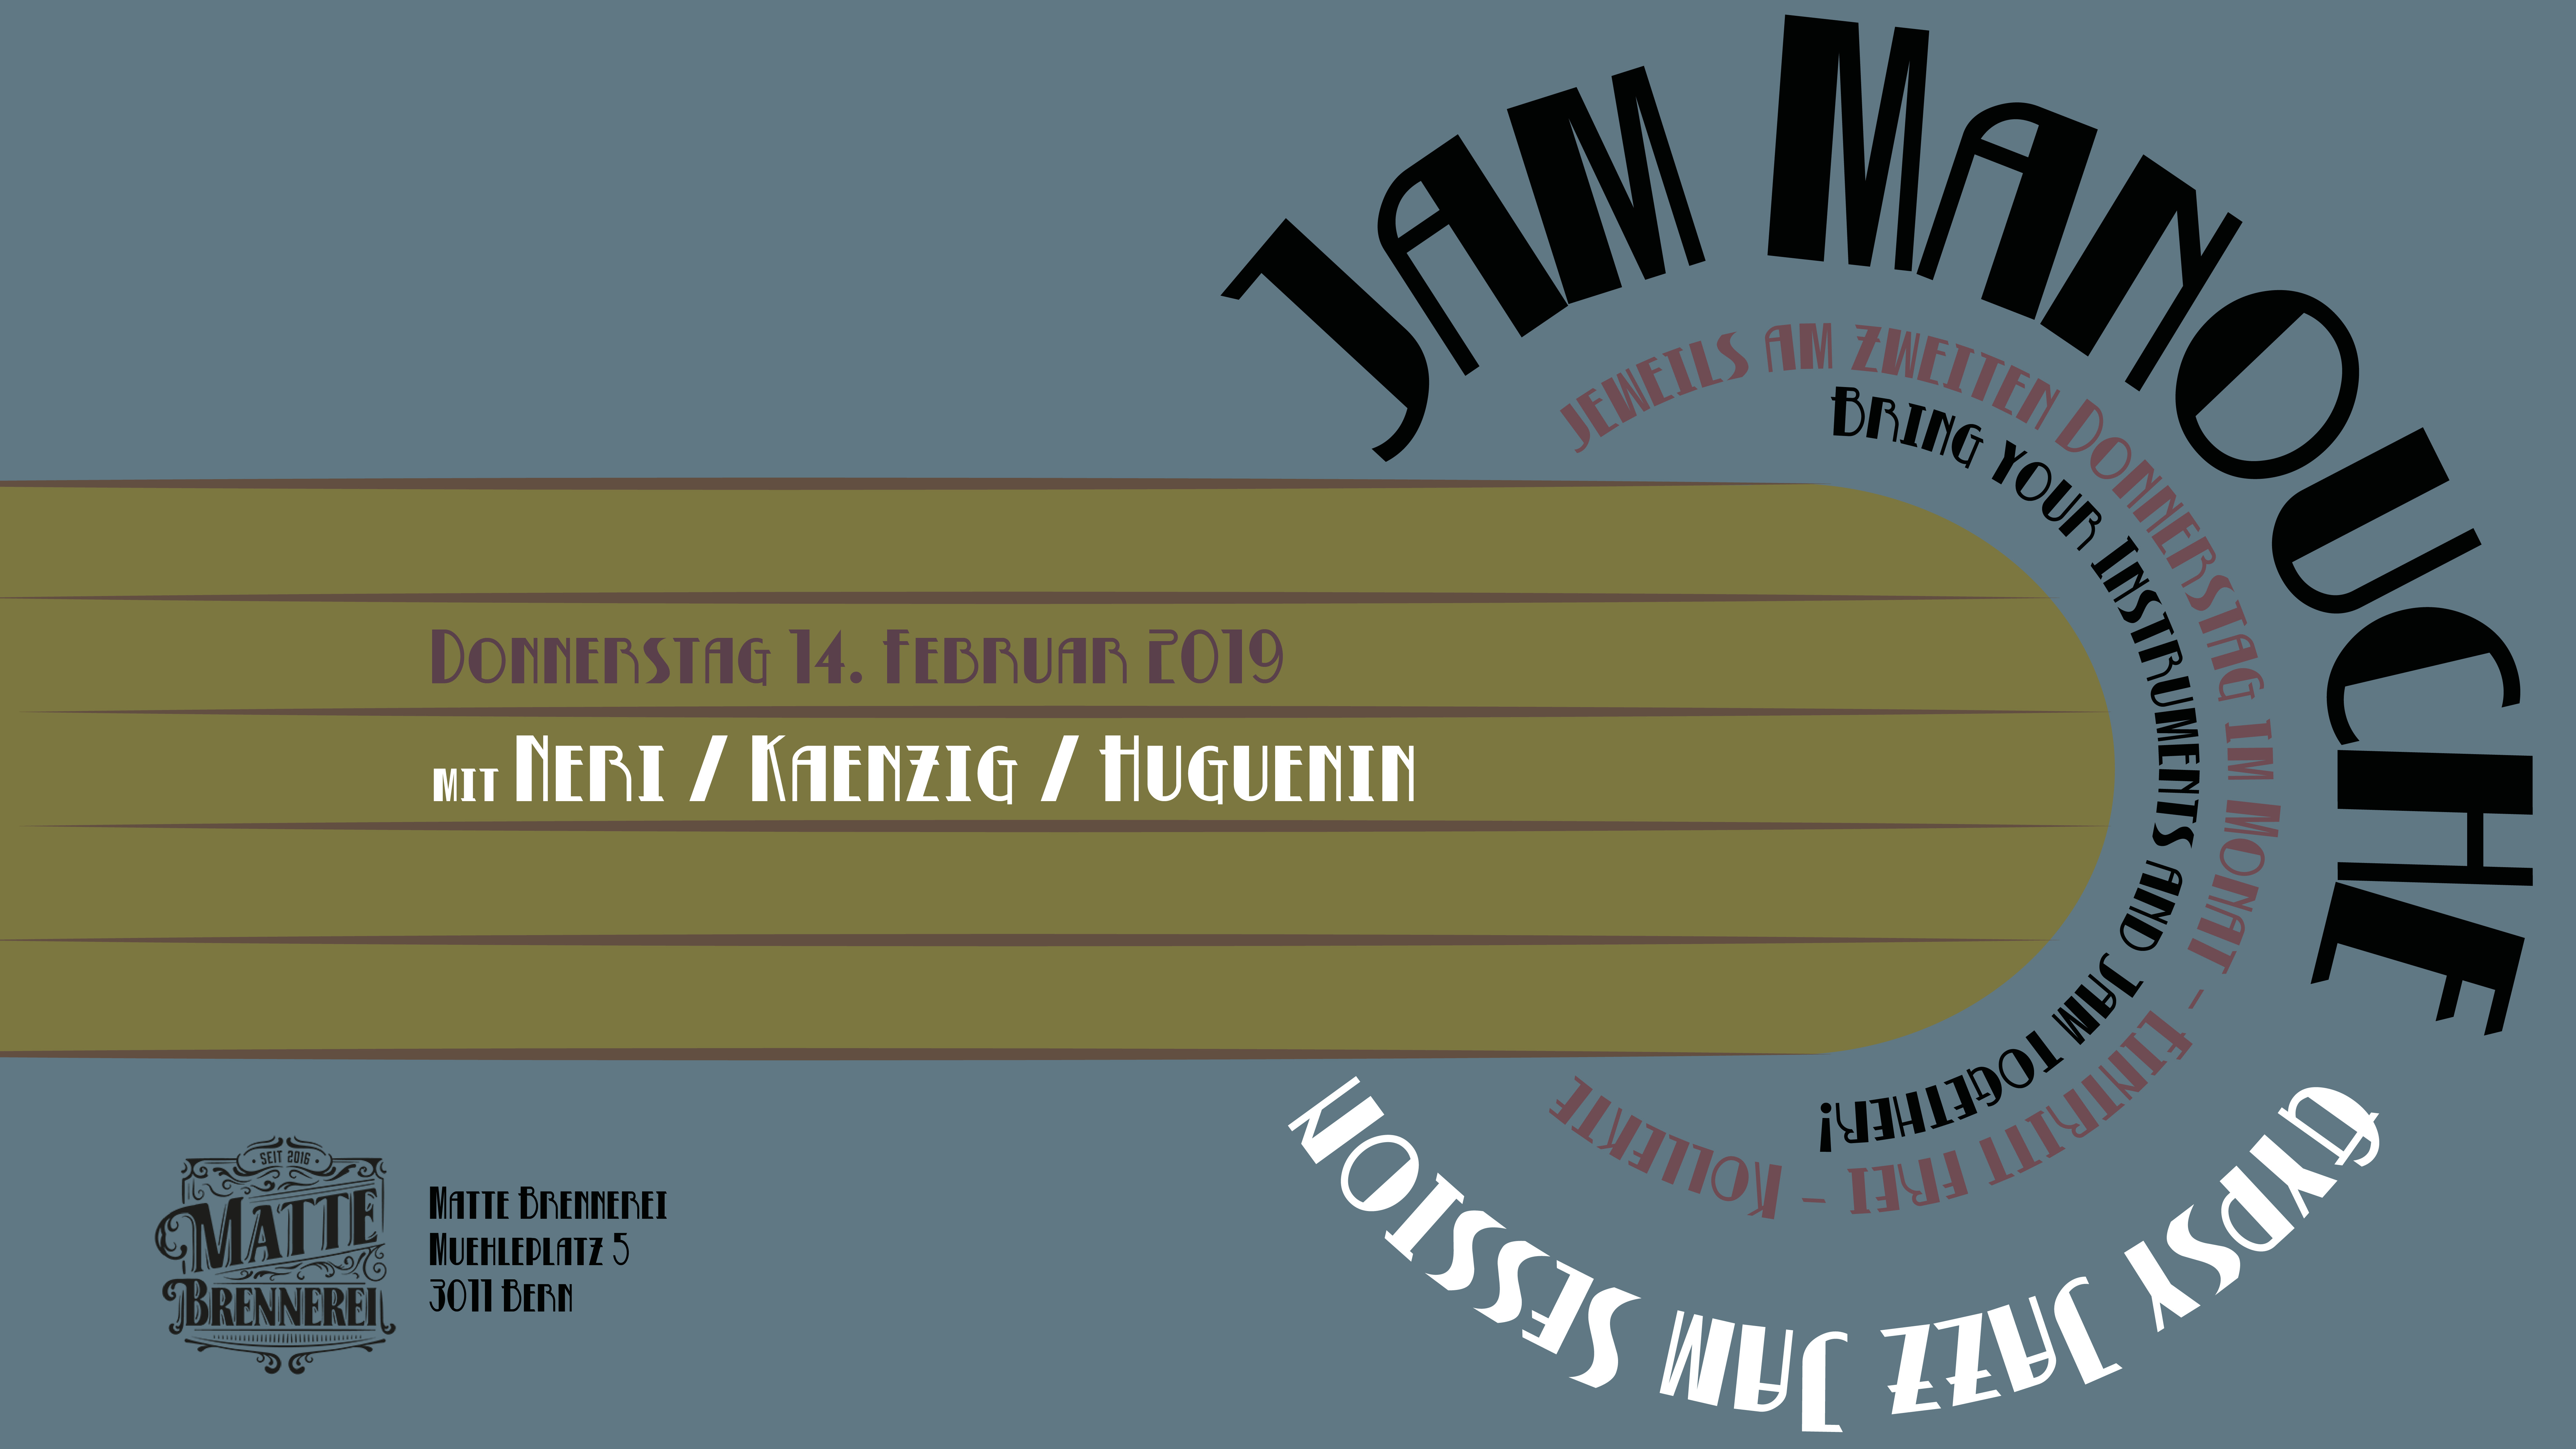 Jam Manouche @ Matte Brennerei